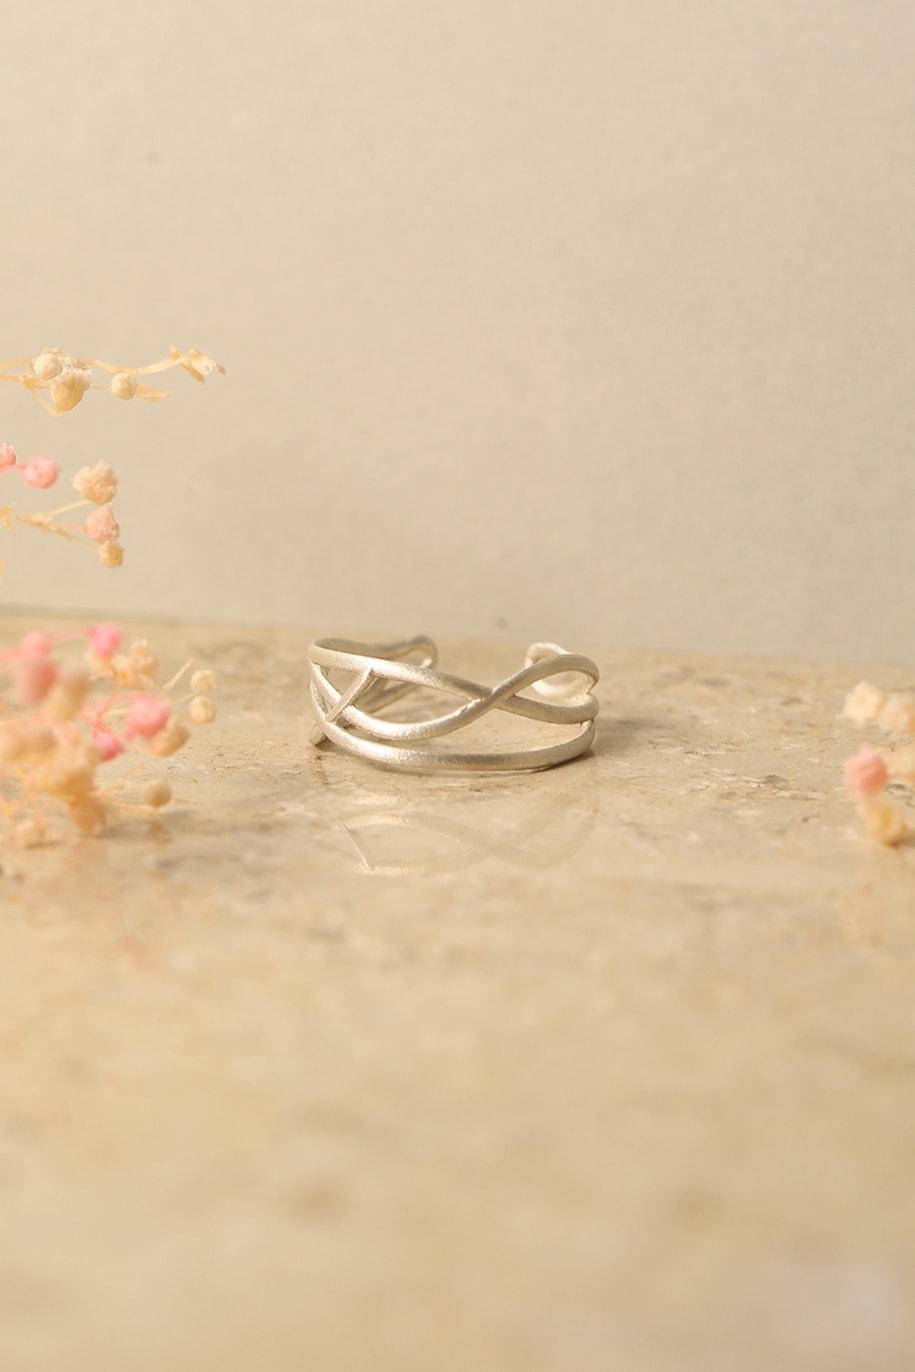 verschnörkelter ring